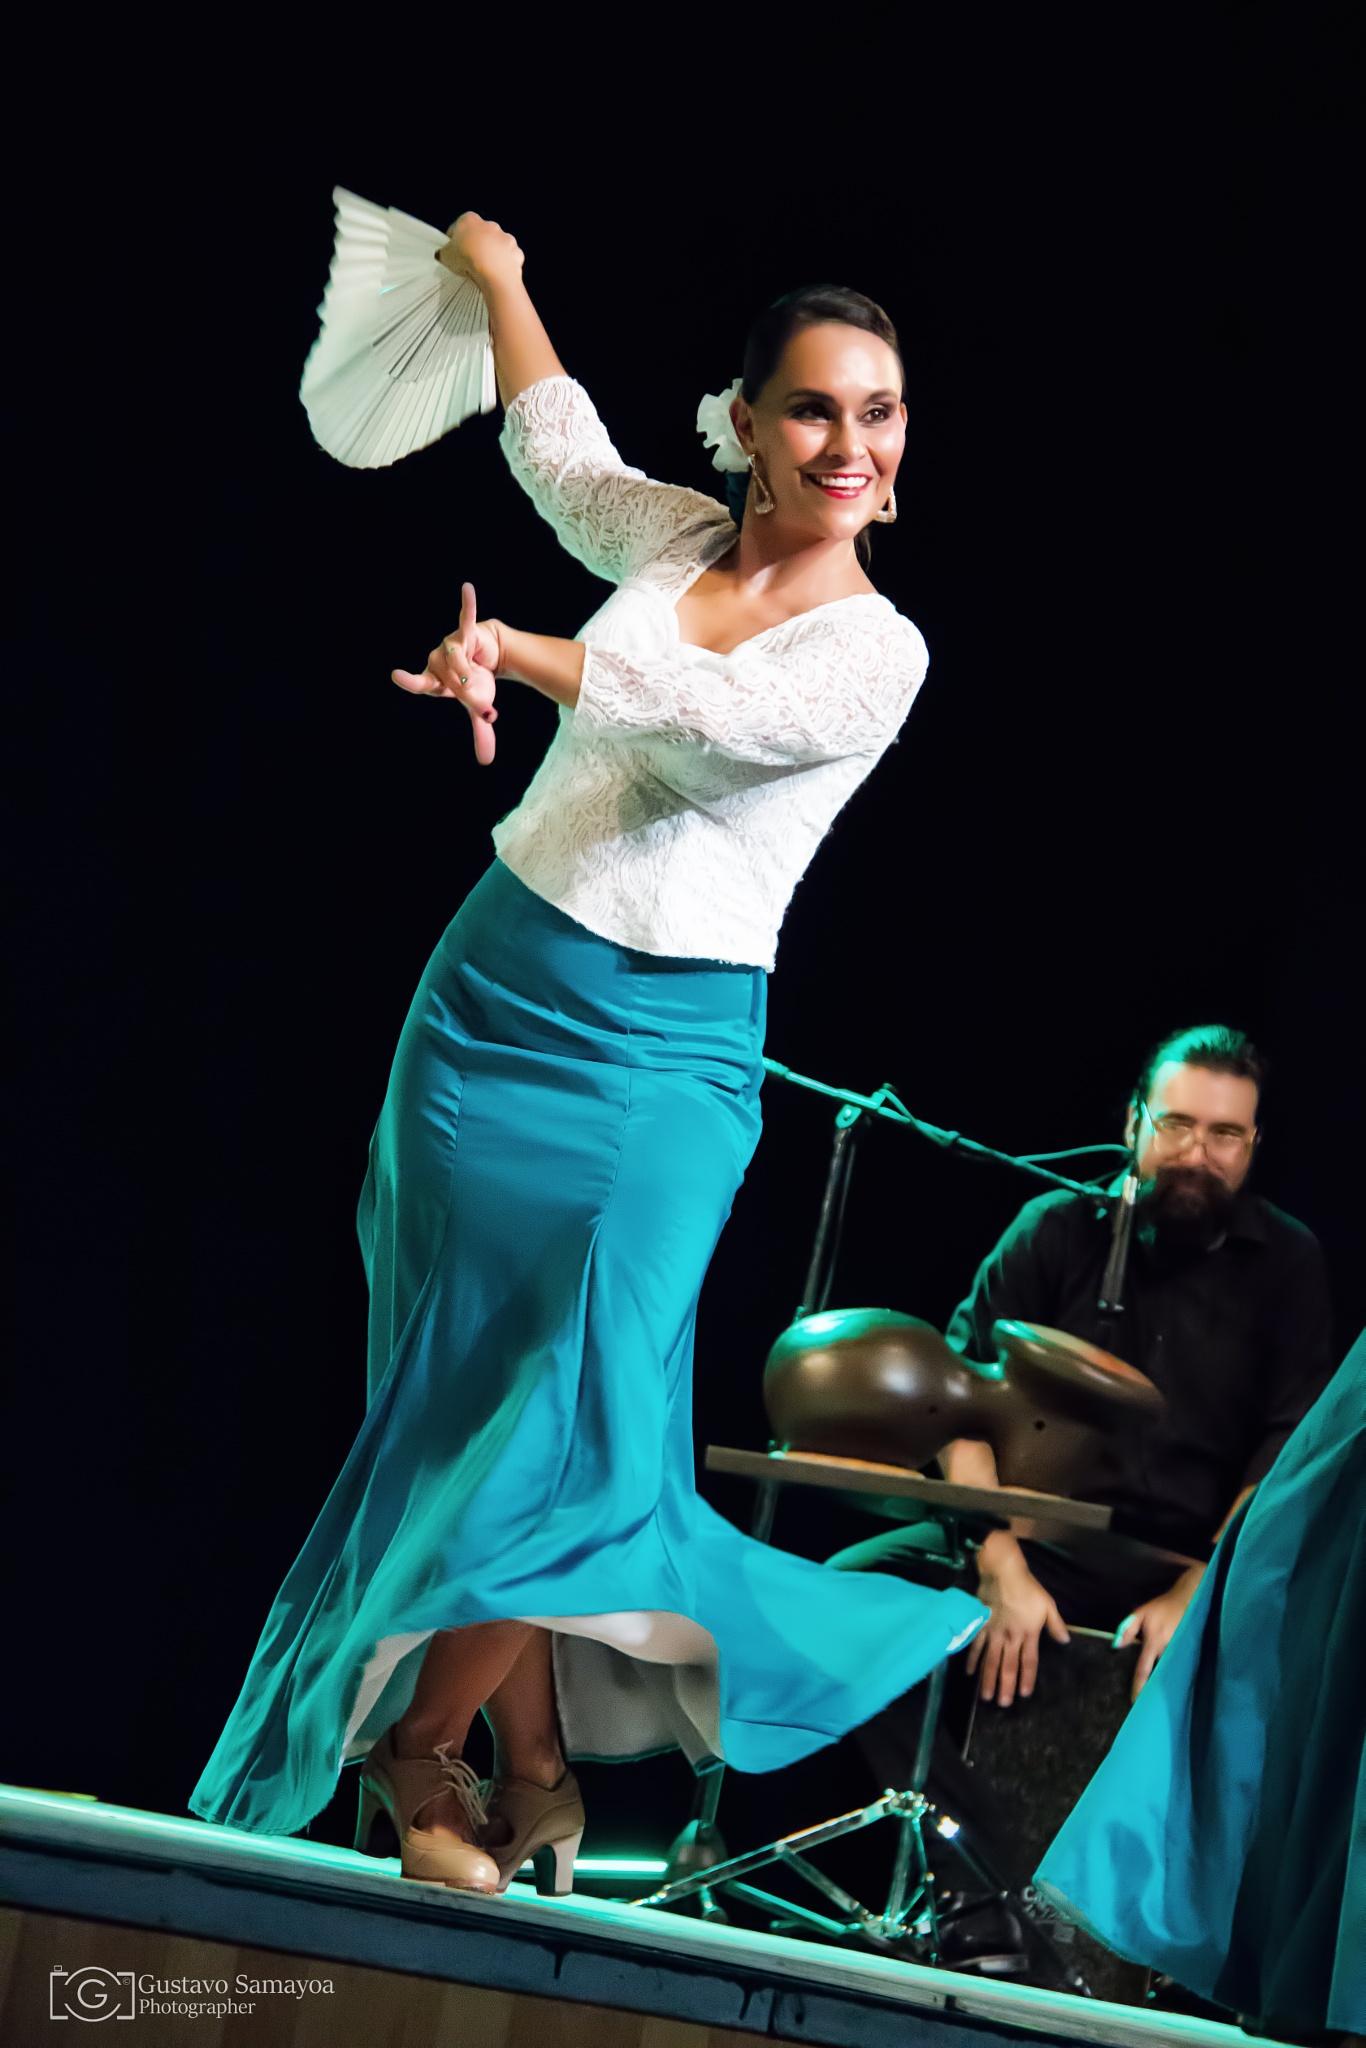 Flamenco by Gustavo Samayoa